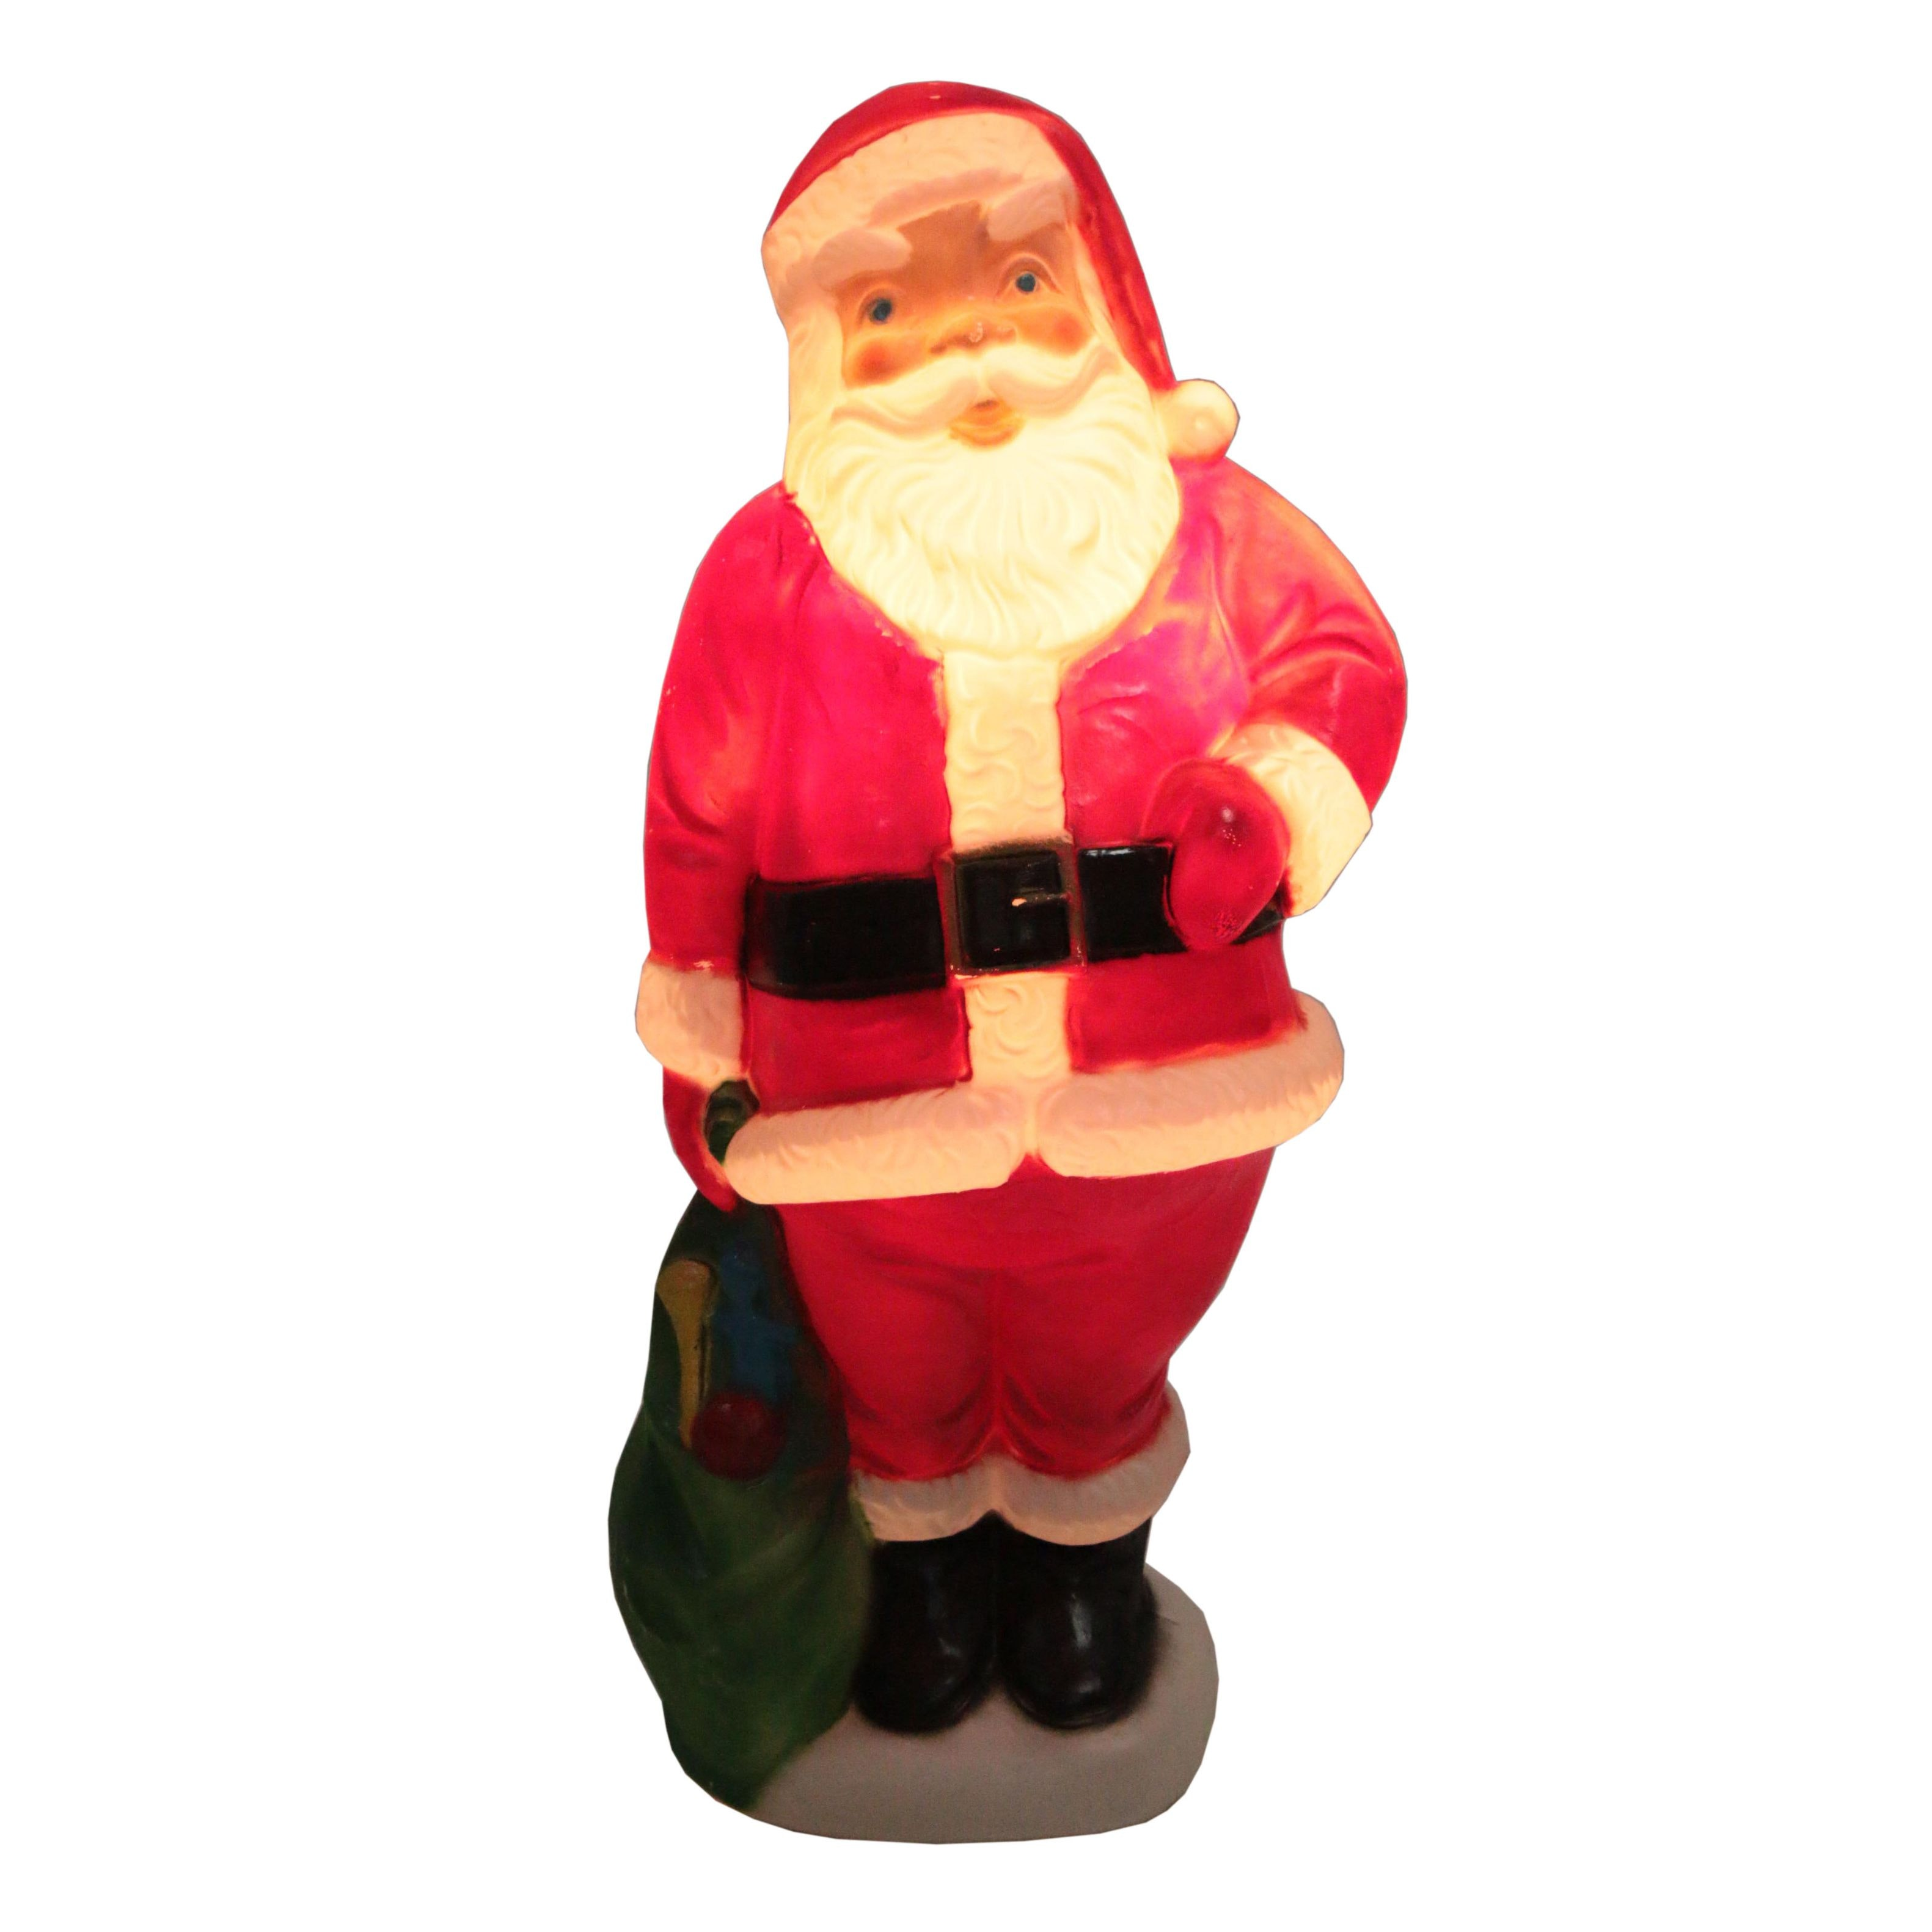 Blow-Mold Plastic Illuminated Santa Claus Outdoor Decoration, 2004